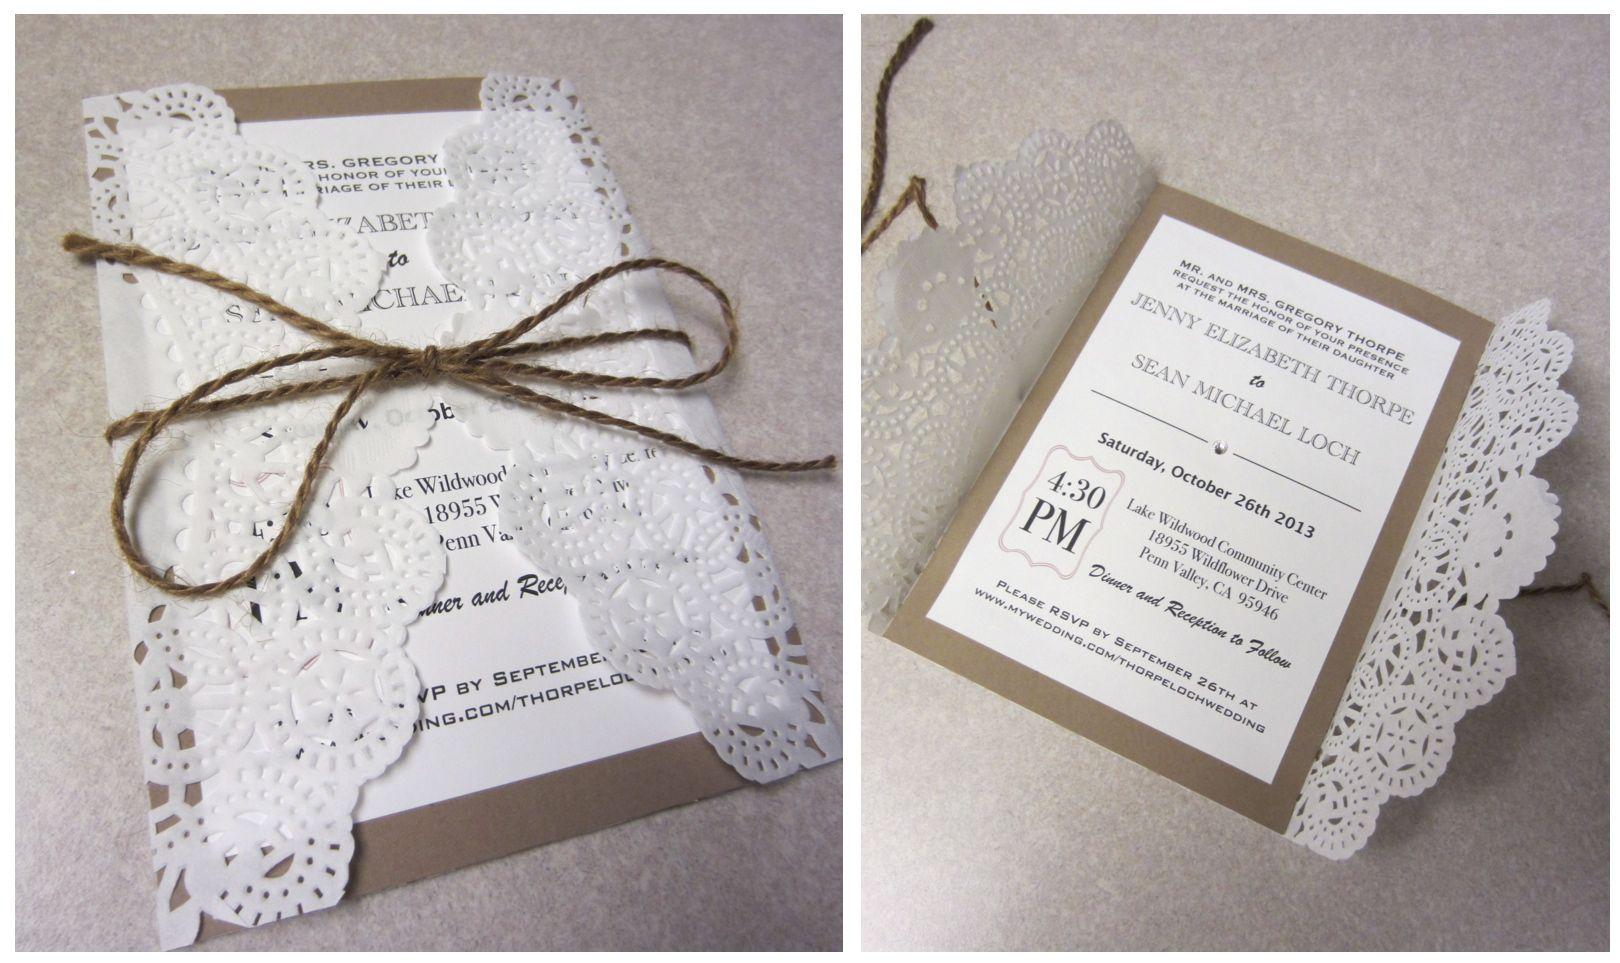 bling wedding invitations Handmade wedding invitations Craft paper doily burlap rope tie bling jewel